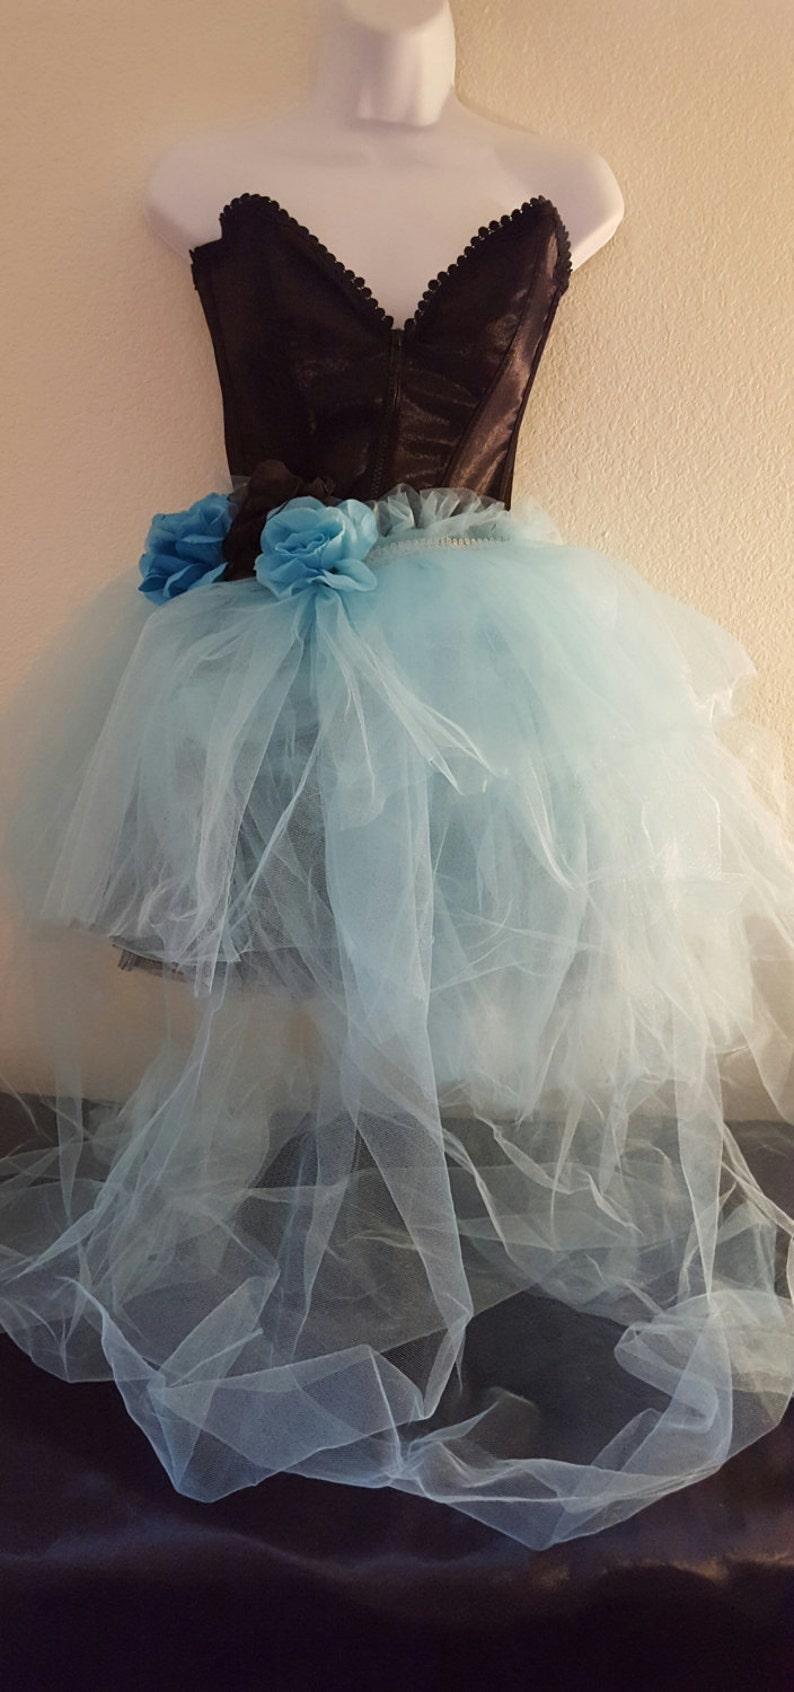 b0b74179b0 Sweetheart Black Satin Corset Blue Rose Waist Asymmetrical